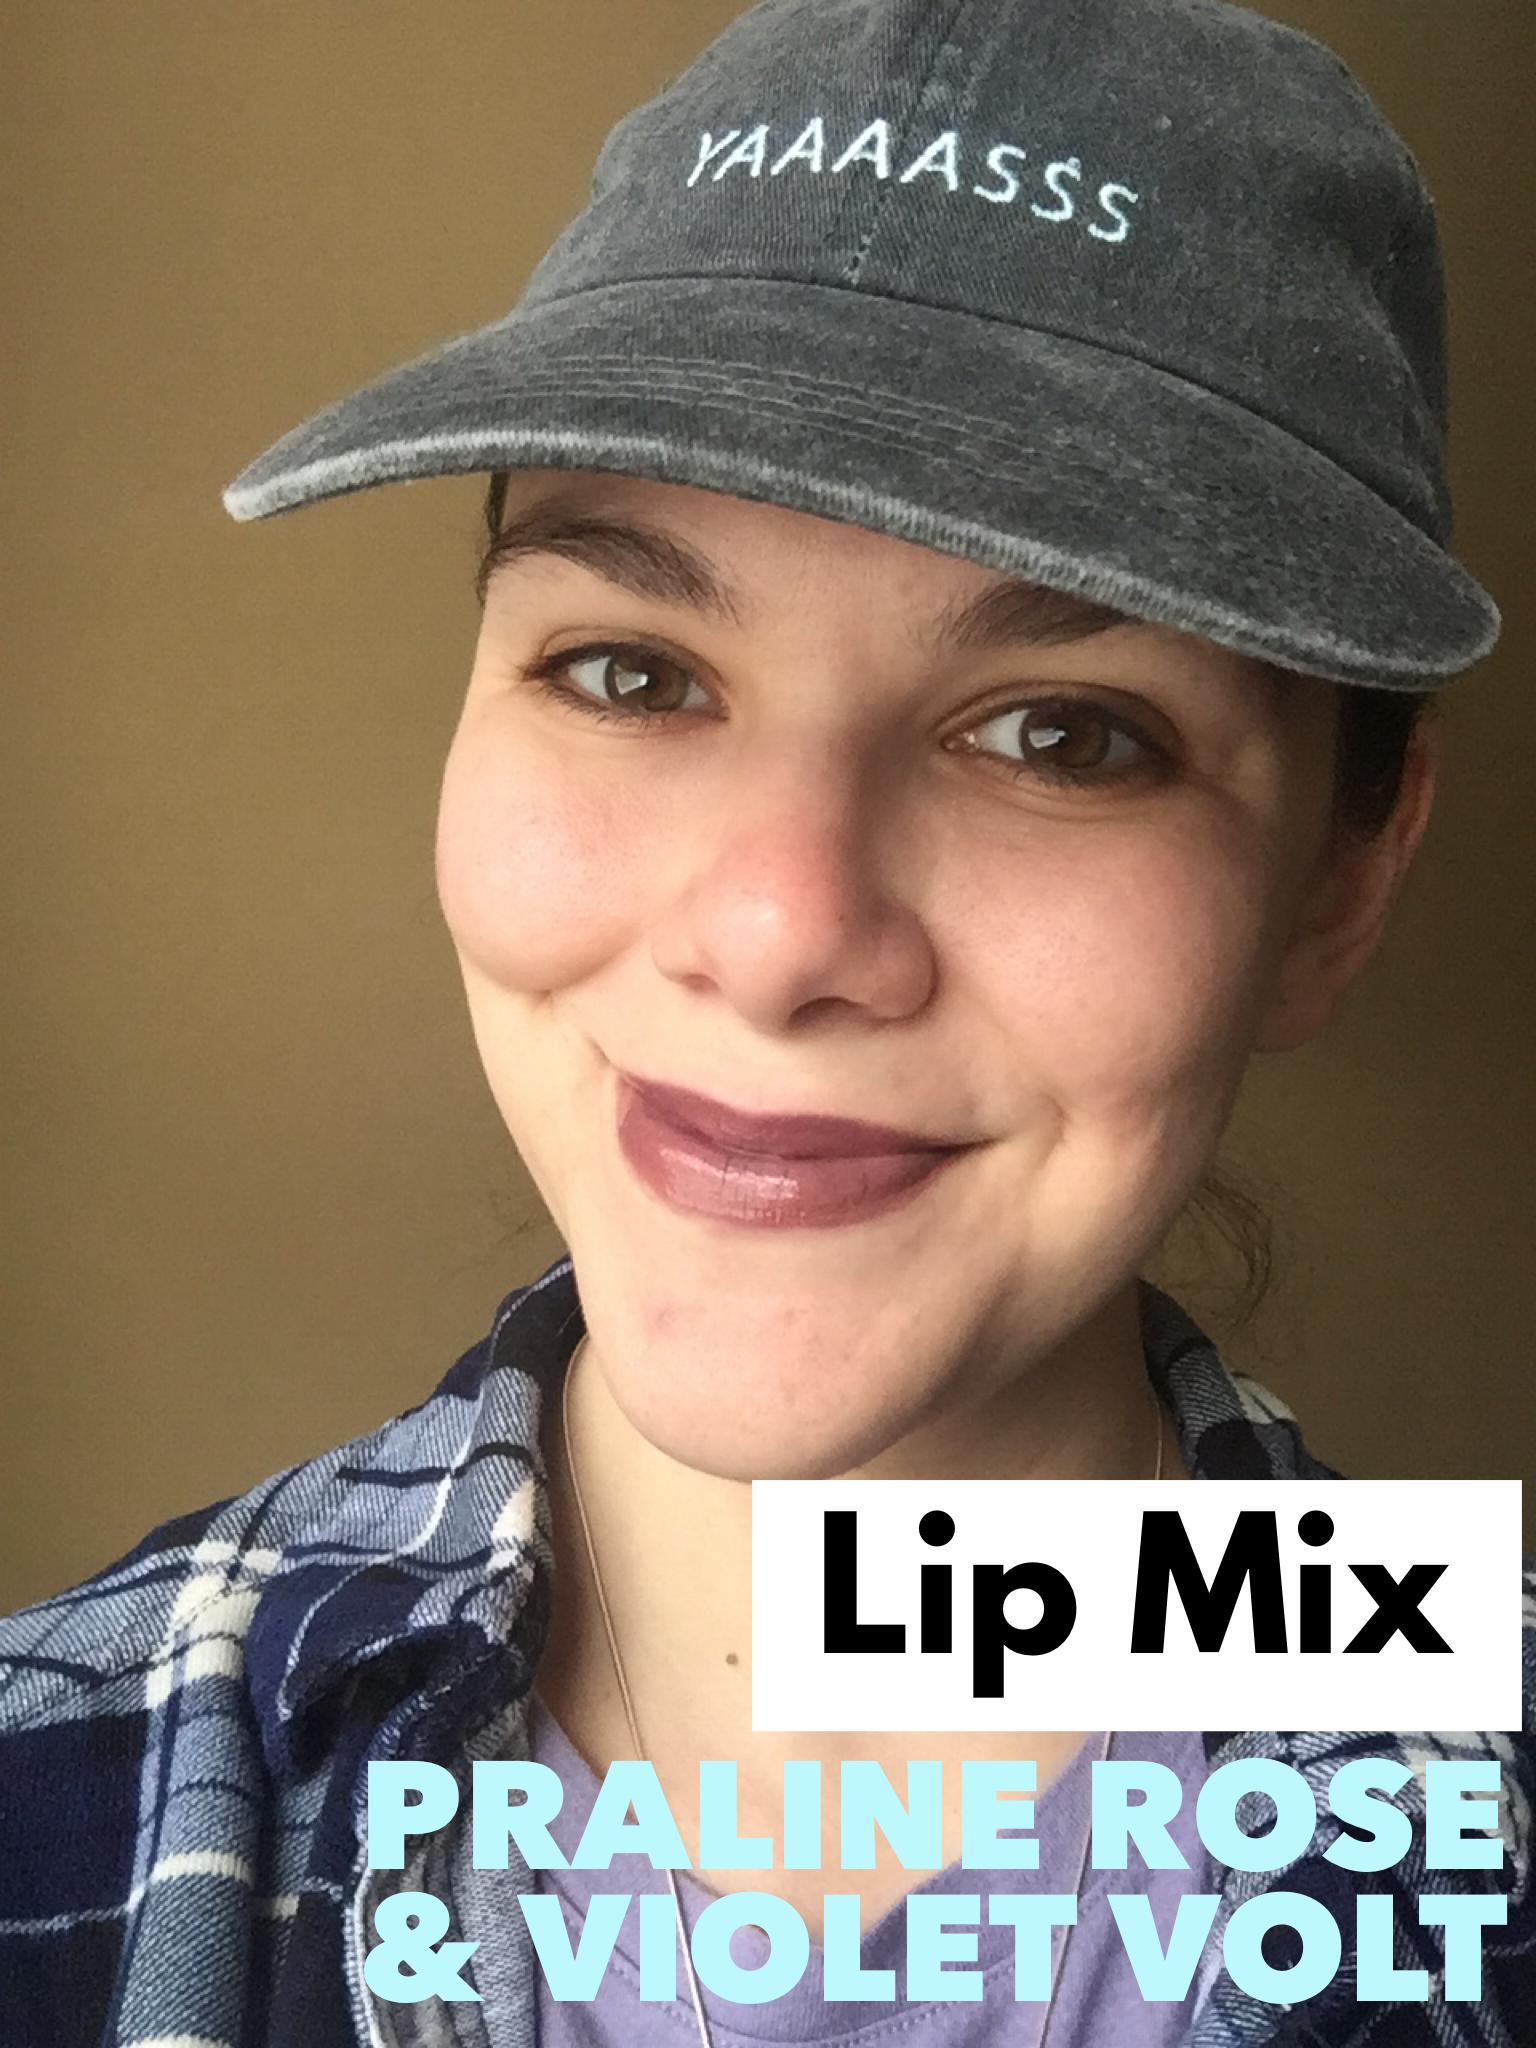 Lip Mix 1x Violet Volt 2x Praline Rose! Find me on FB: THE SUNSHINE BEAUTY BAR Distributor ID# 415981 #mauvelipstick